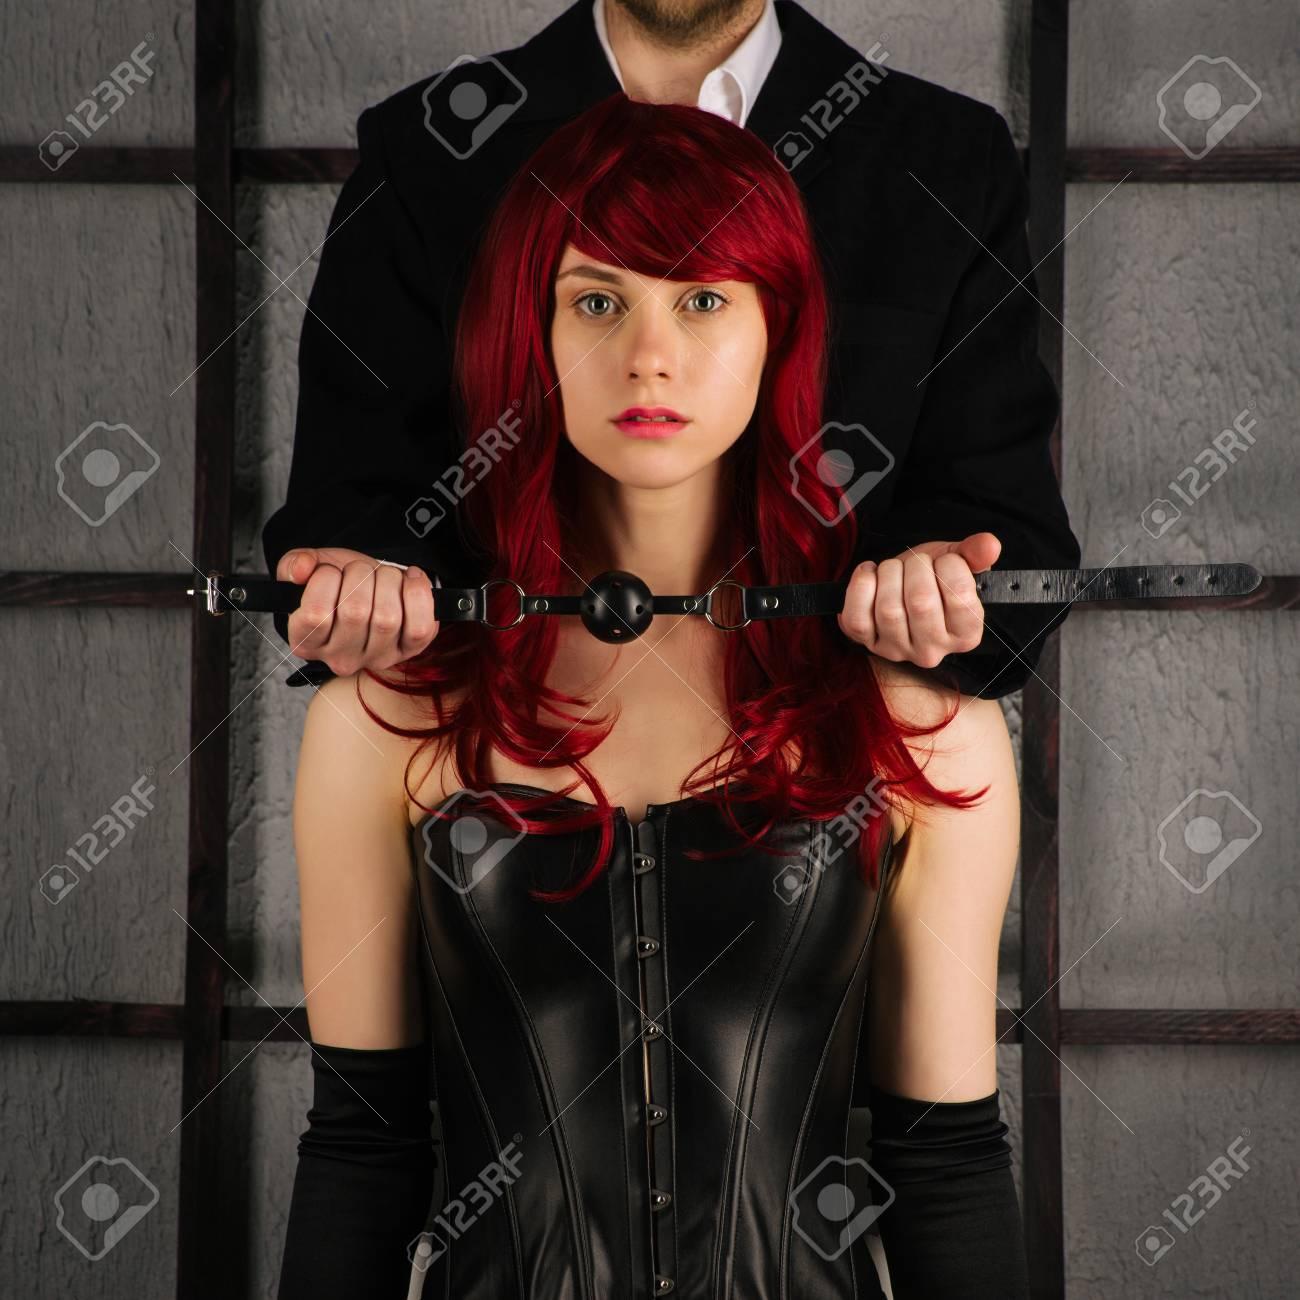 Free movies of cartoon bondage sex